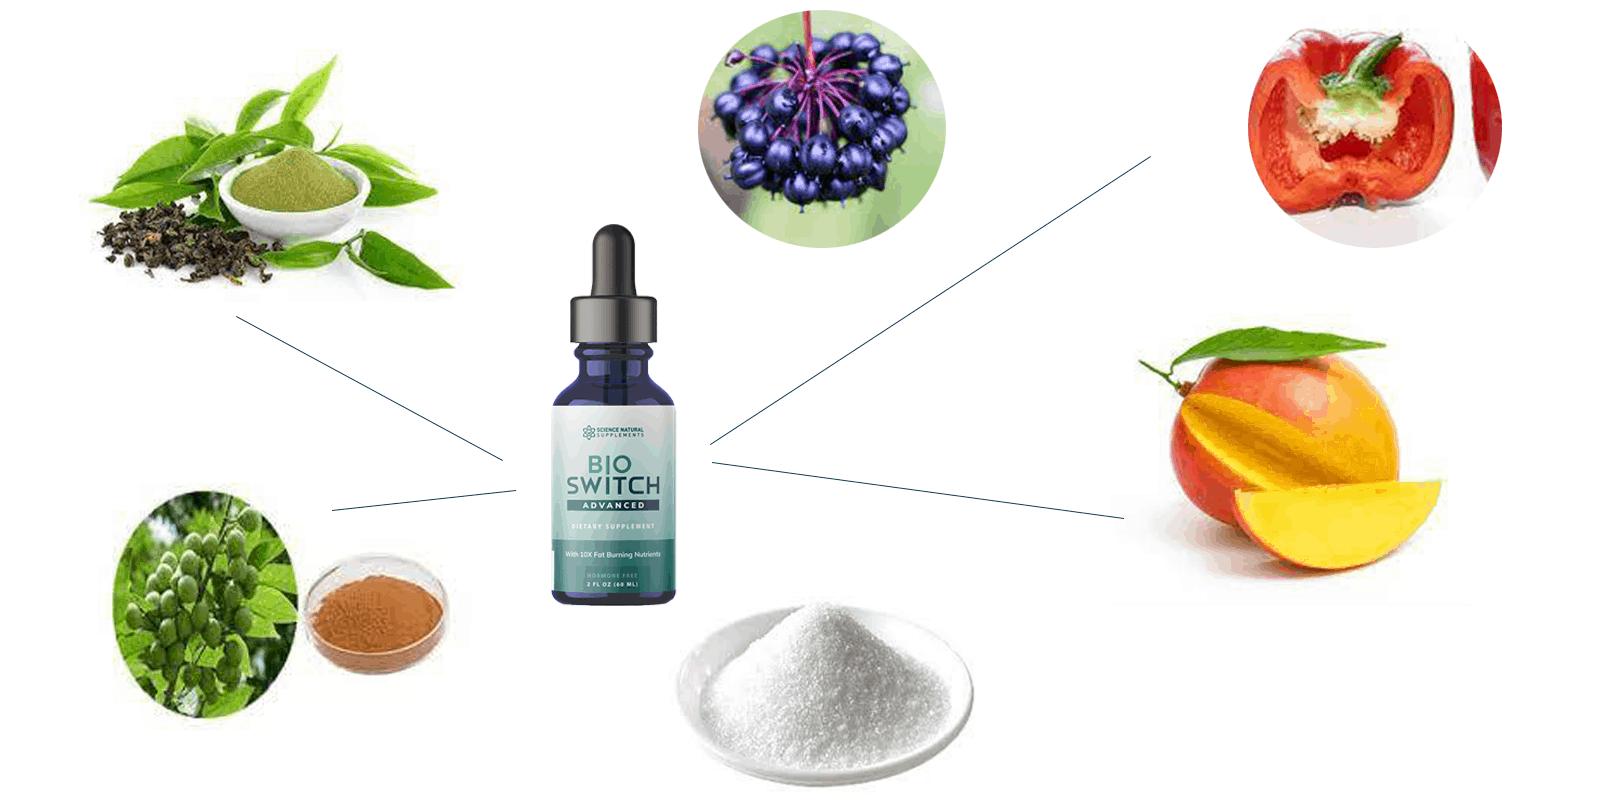 BioSwitch Advanced ingredients